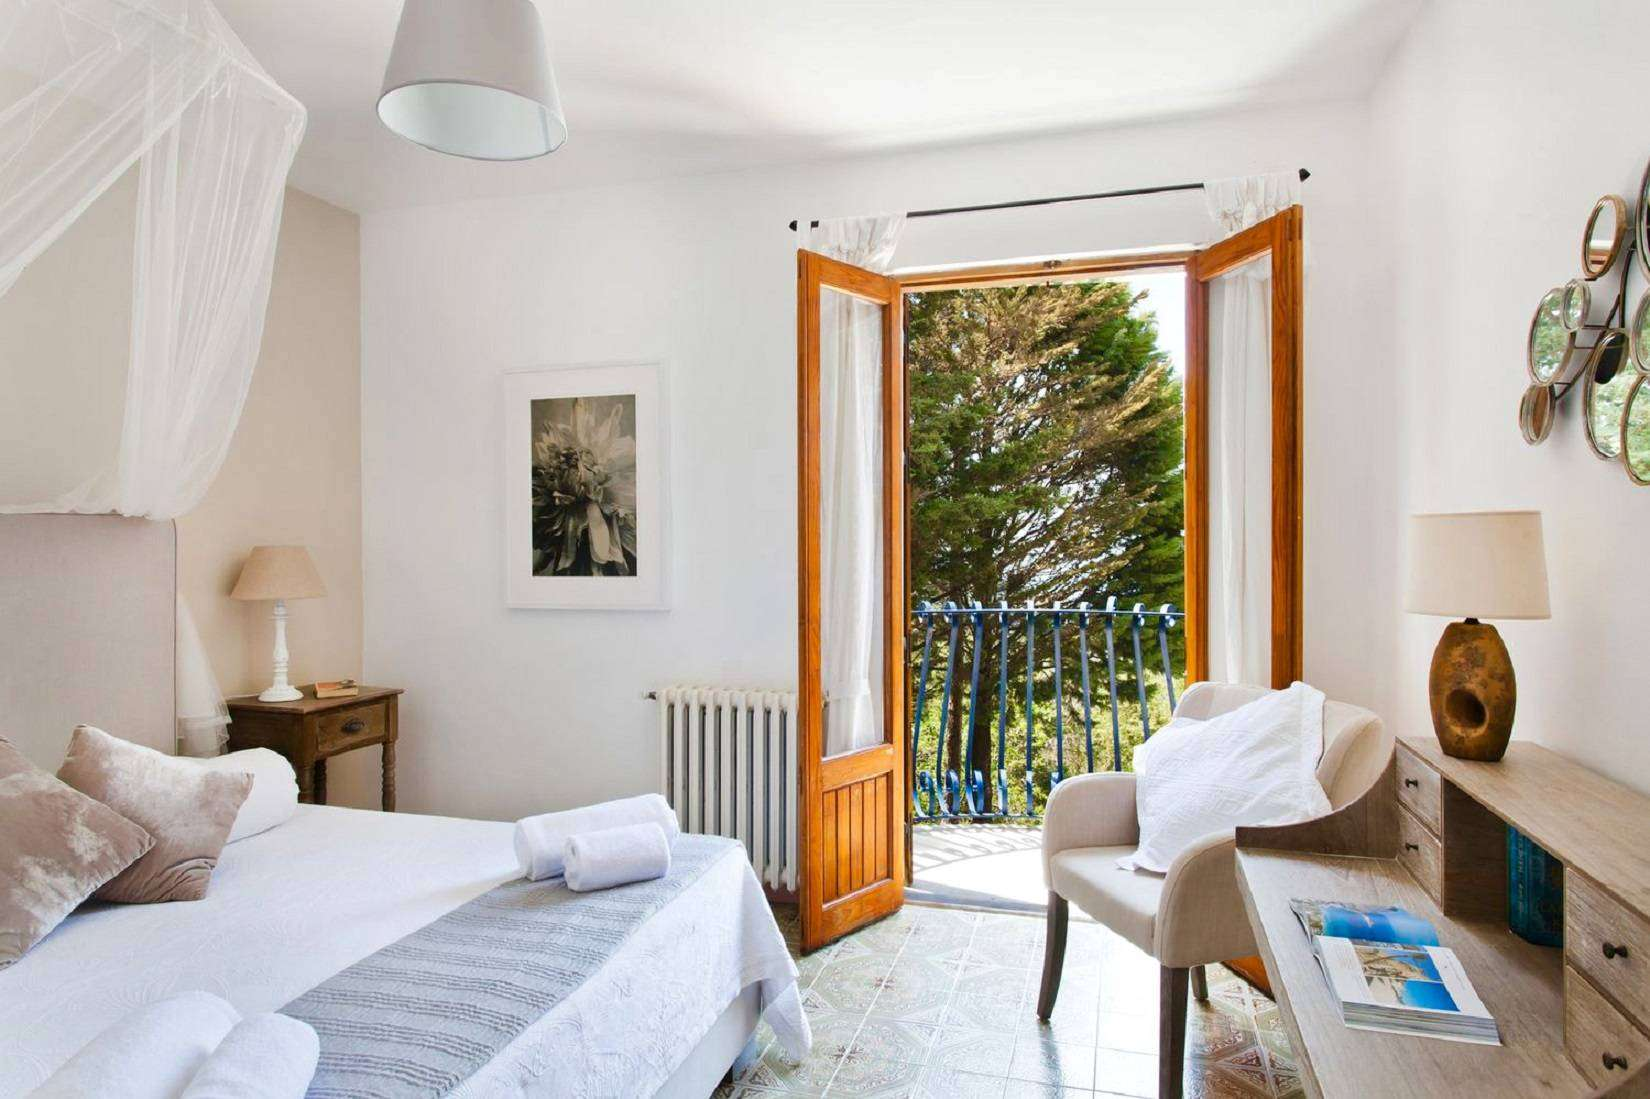 6 La Rocca Double bedroom